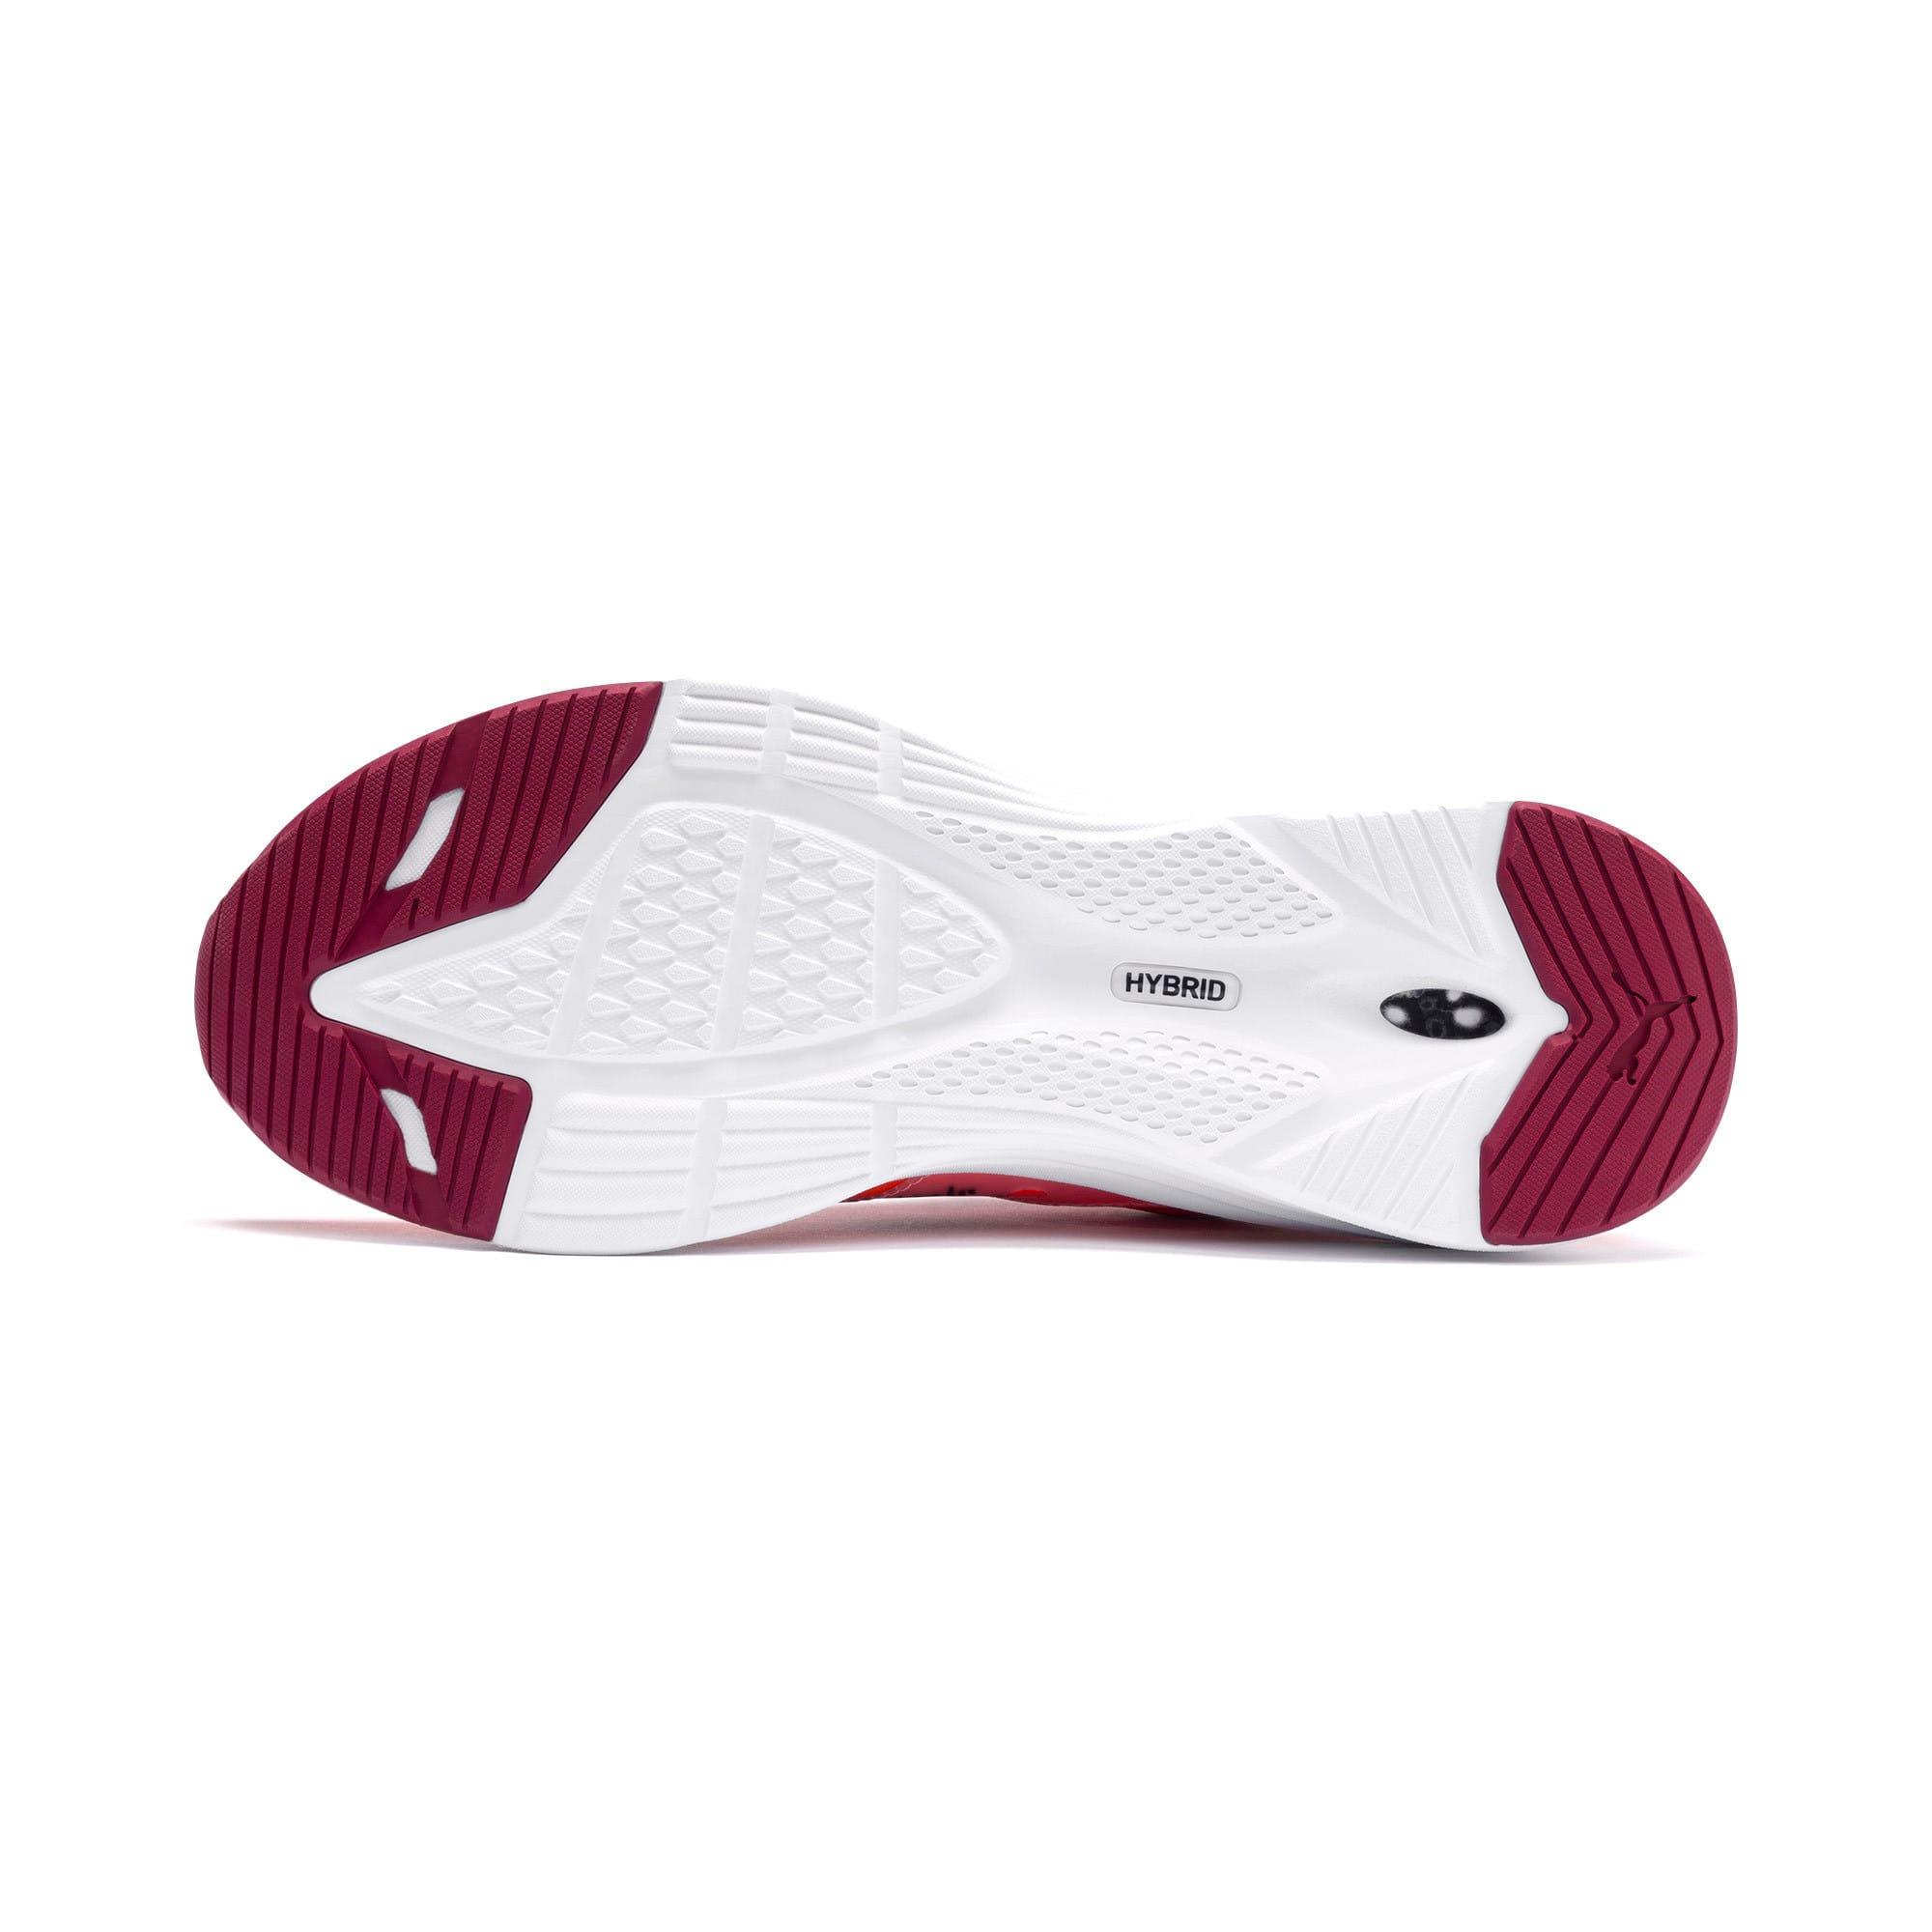 Thumbnail 4 of HYBRID Fuego Men's Running Shoes, Nrgy Red-Rhubarb, medium